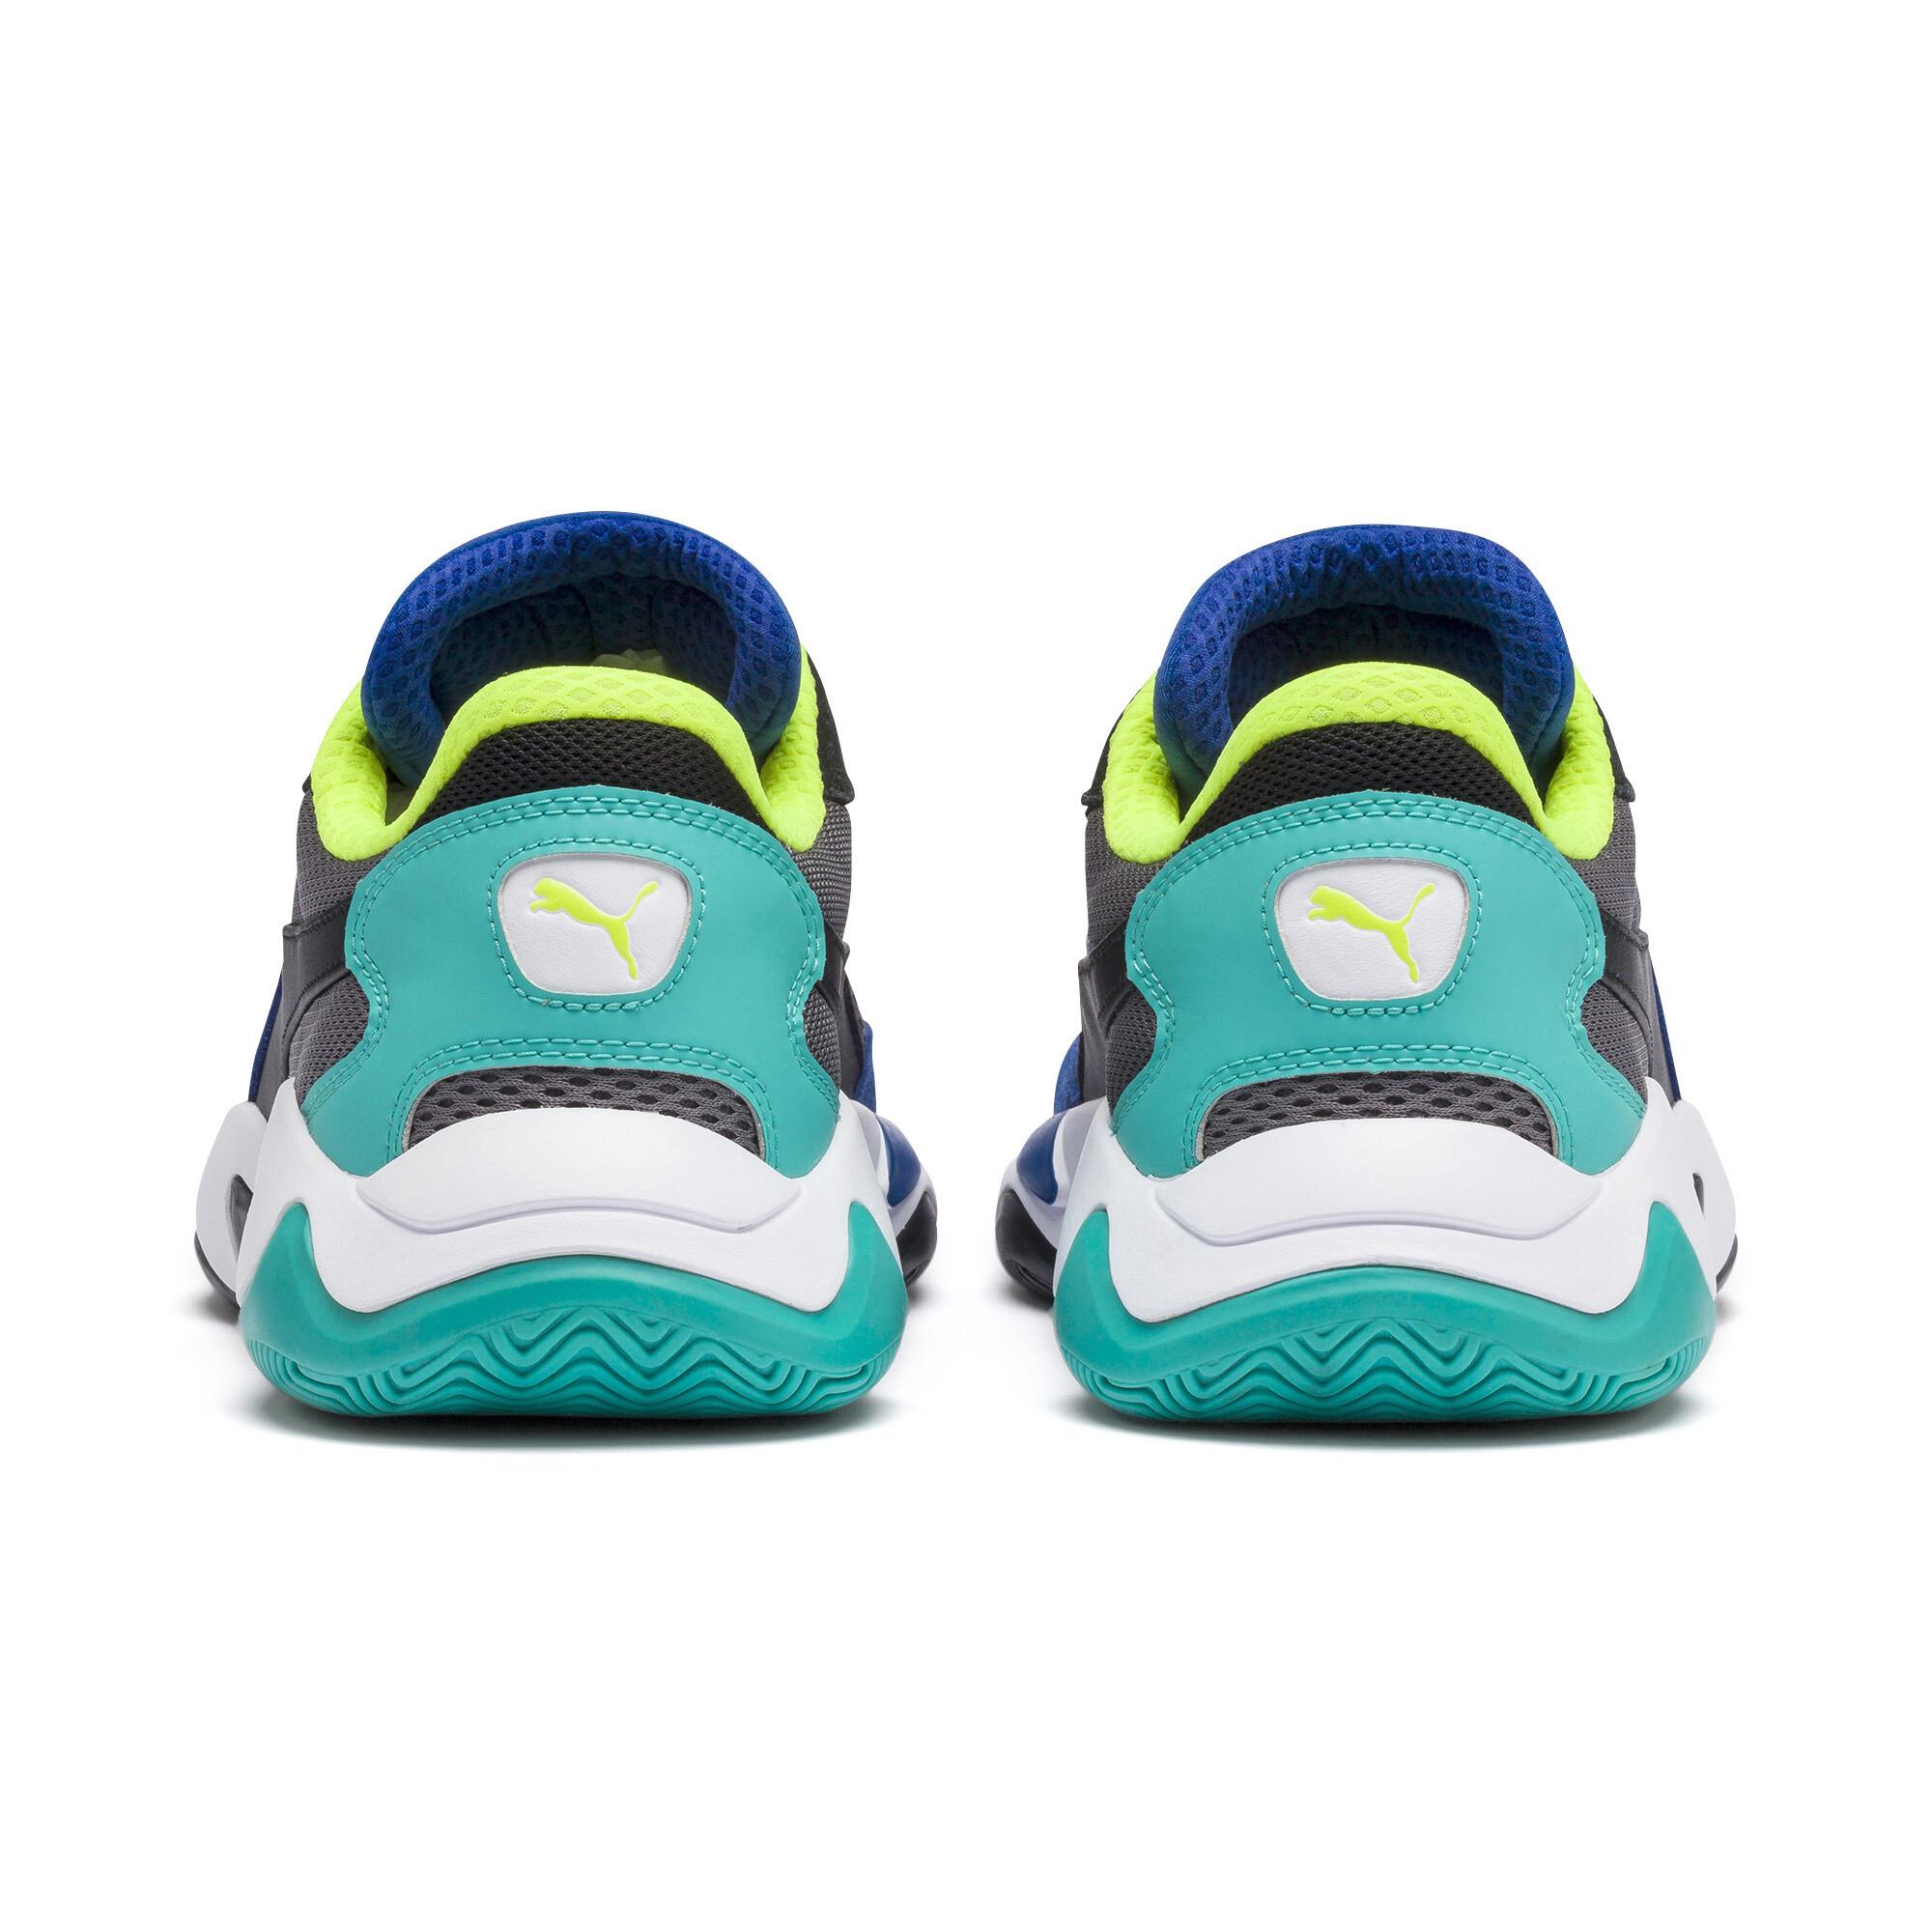 PUMA-Storm-Origin-Sneakers-Unisex-Shoe-Evolution thumbnail 10